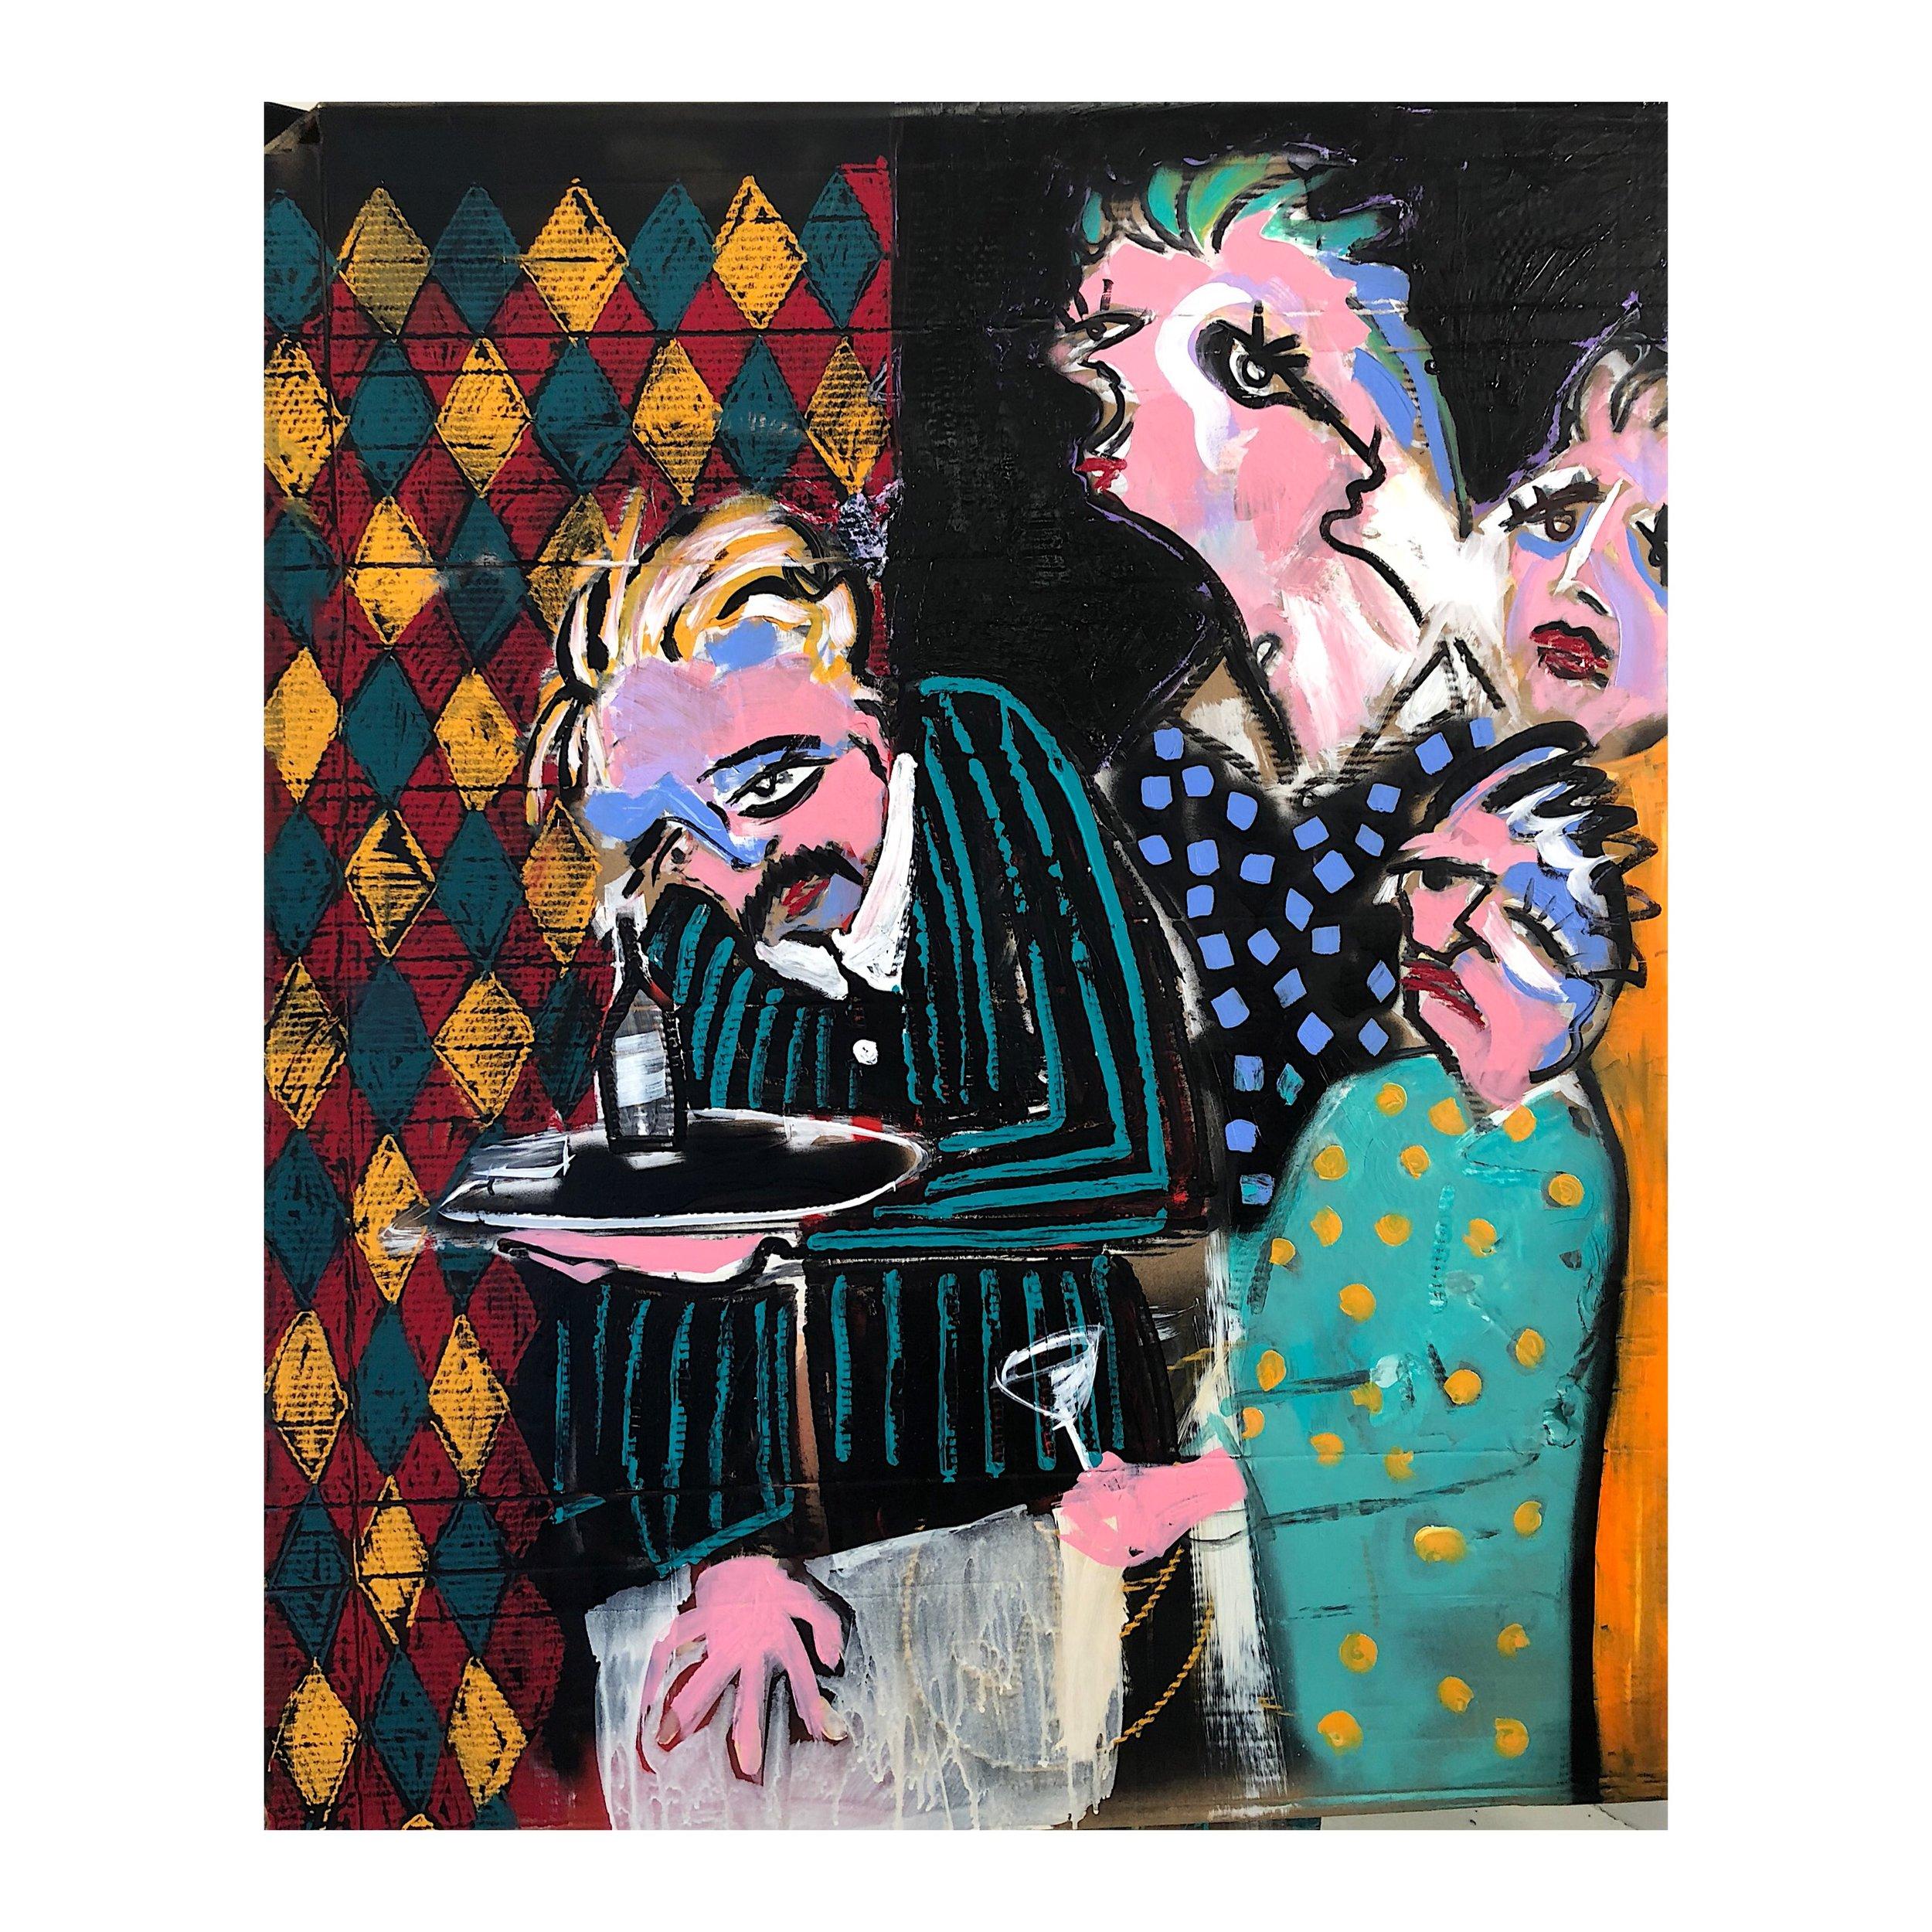 'Last Orders in Paris', Acrylic and pastel on cardboard, 100x123cm